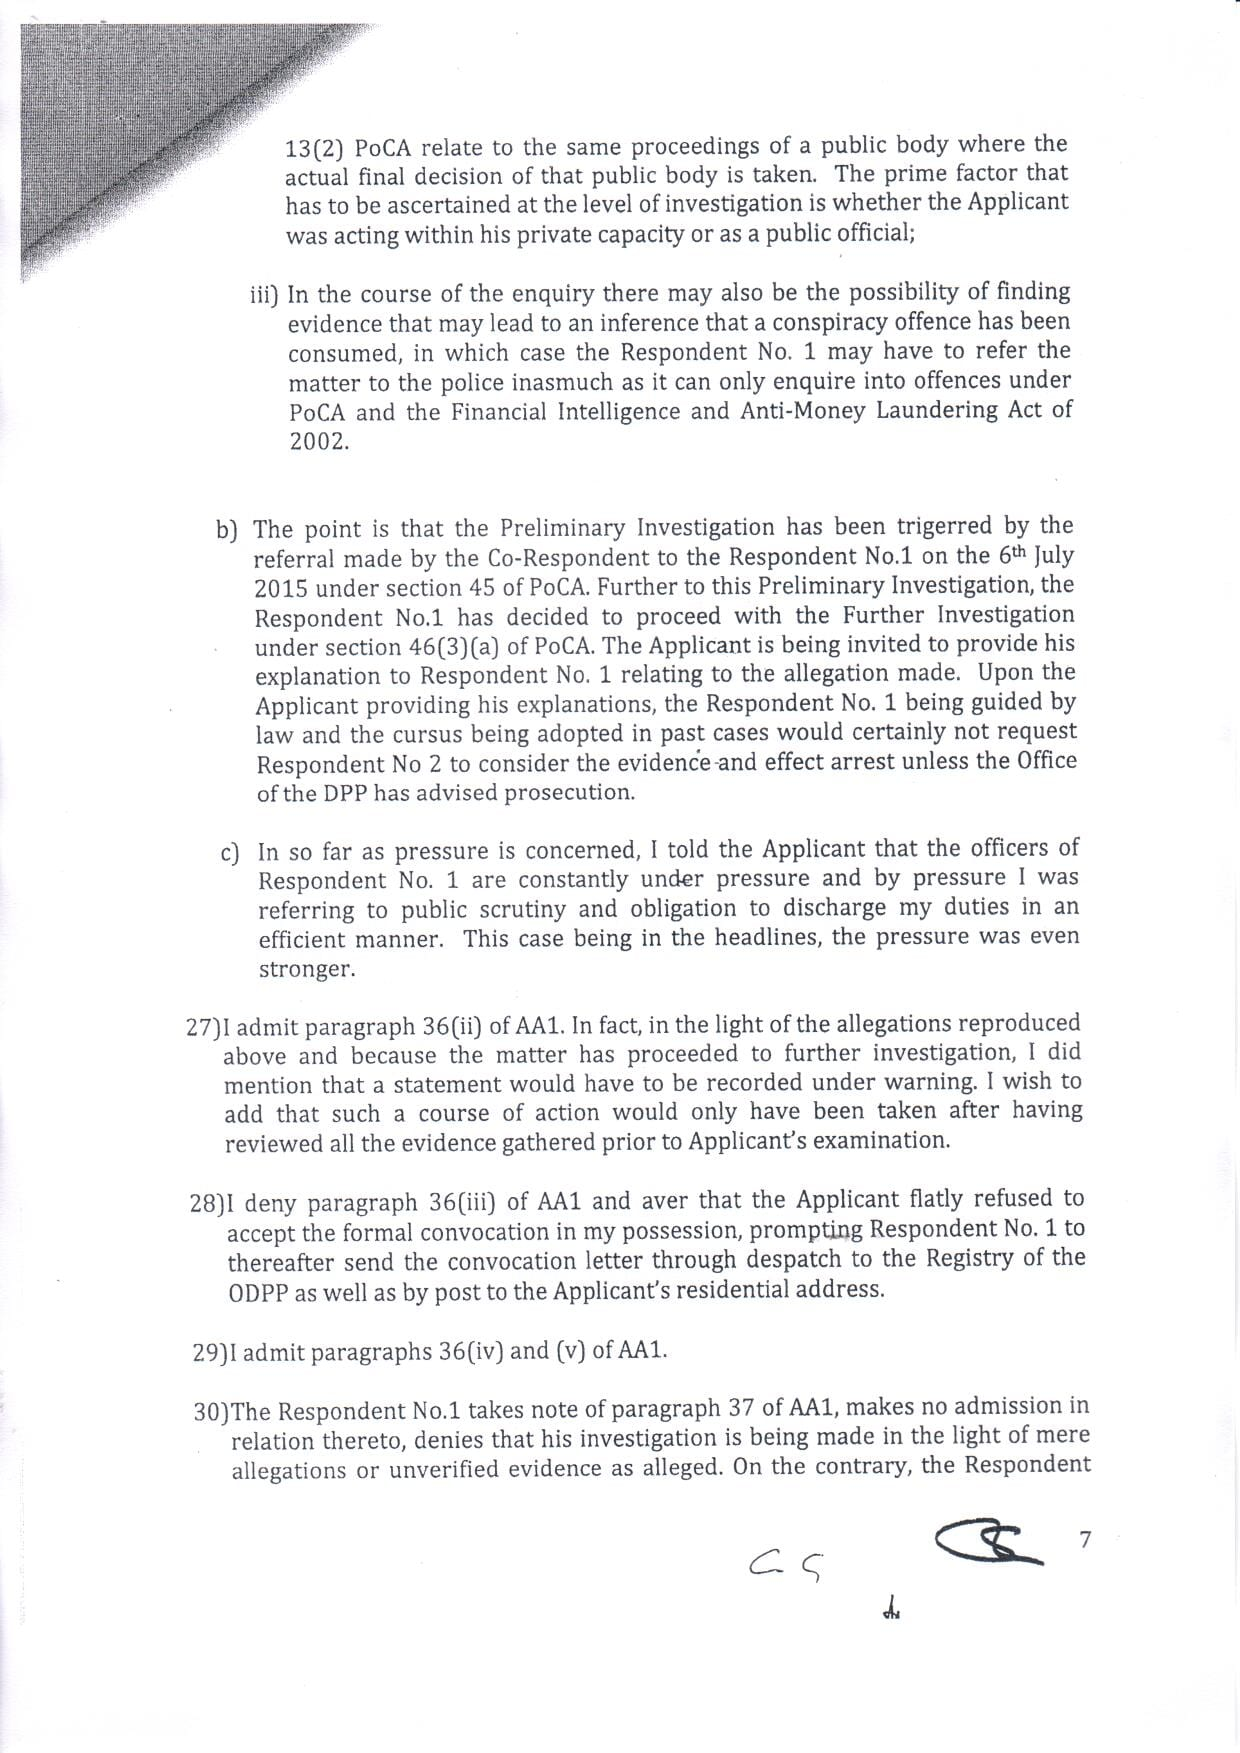 affidavit ICAC boolell 07